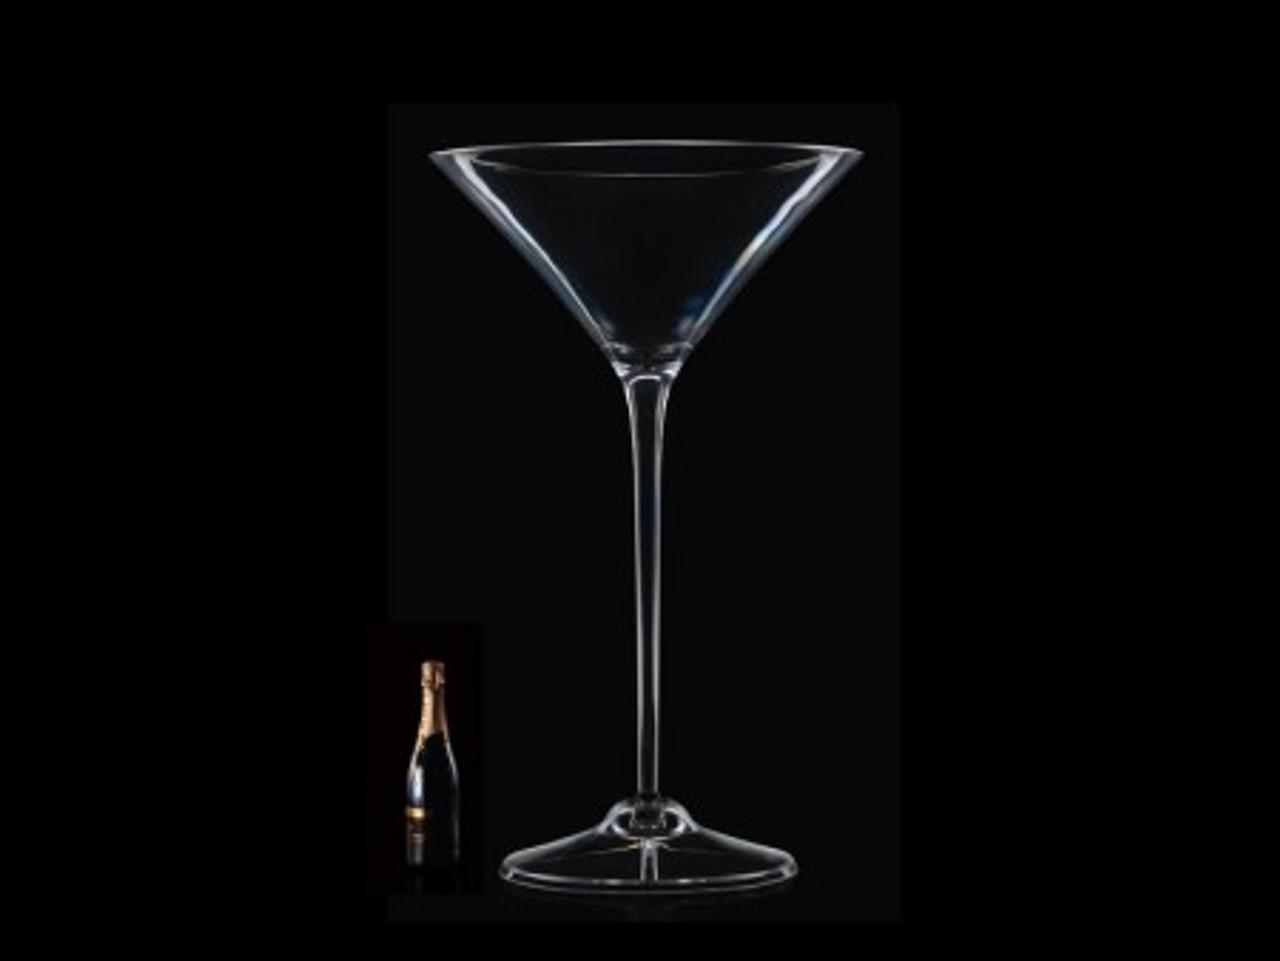 Jumbo, Margarita, Punch, Bowl, Cup, Glass, enormous, gigantic, huge, big, Martini, Wine, Champagne, Ice bucket, bottle, presenter, holder, container, restaurant, bar, acrylic, plastic,